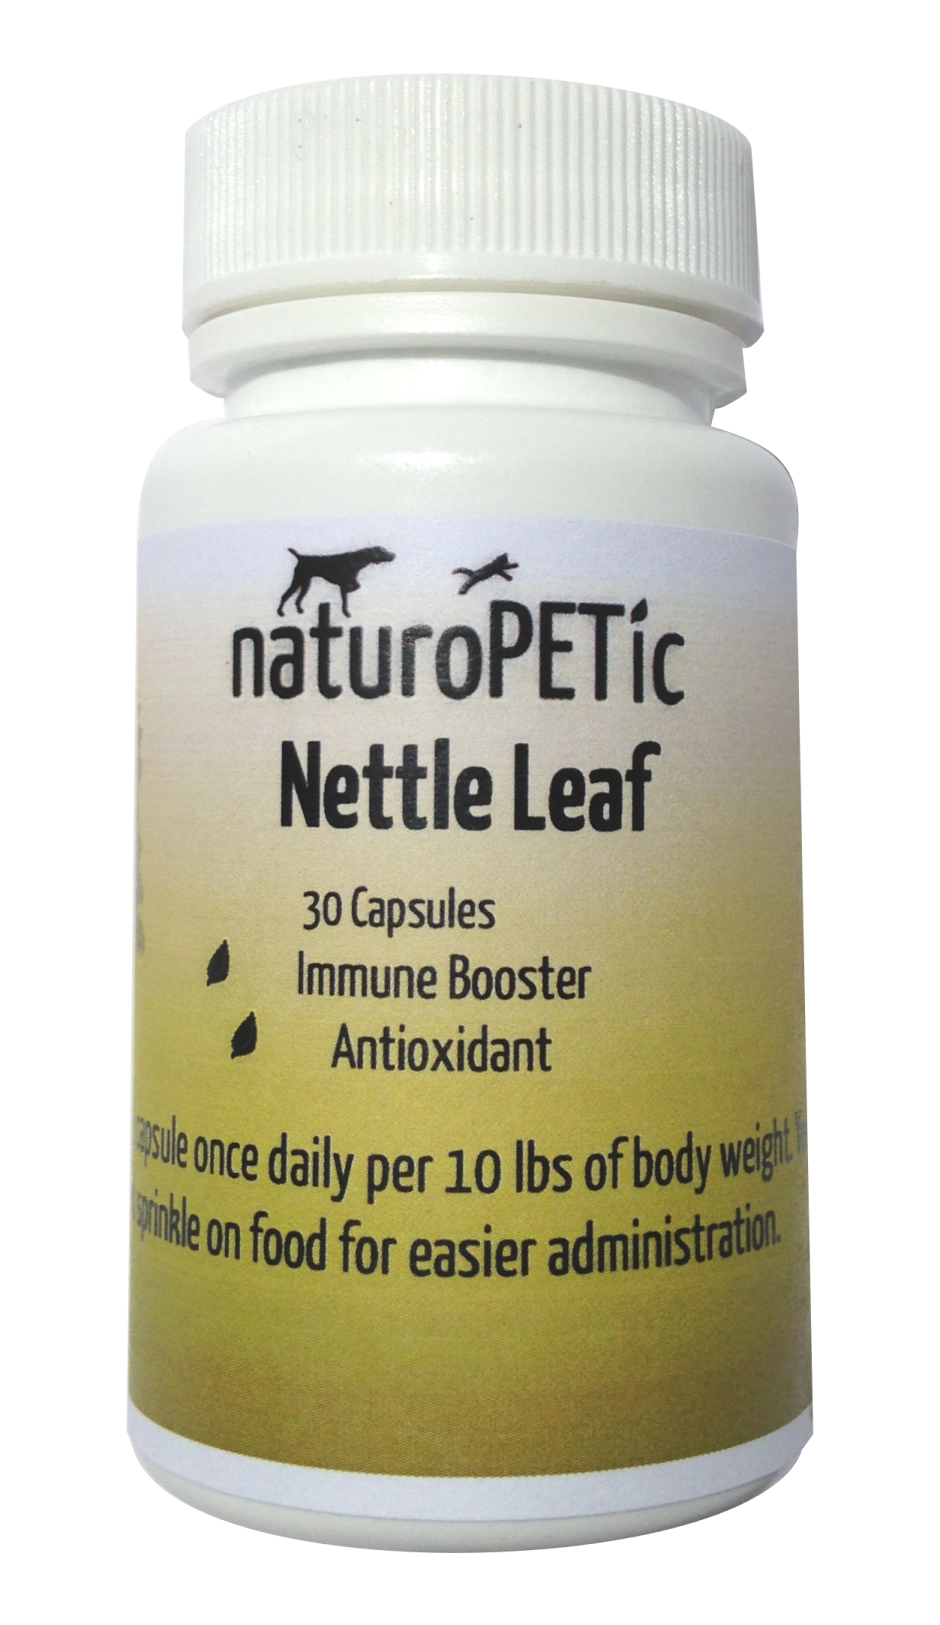 Nettle Leaf Naturopetic